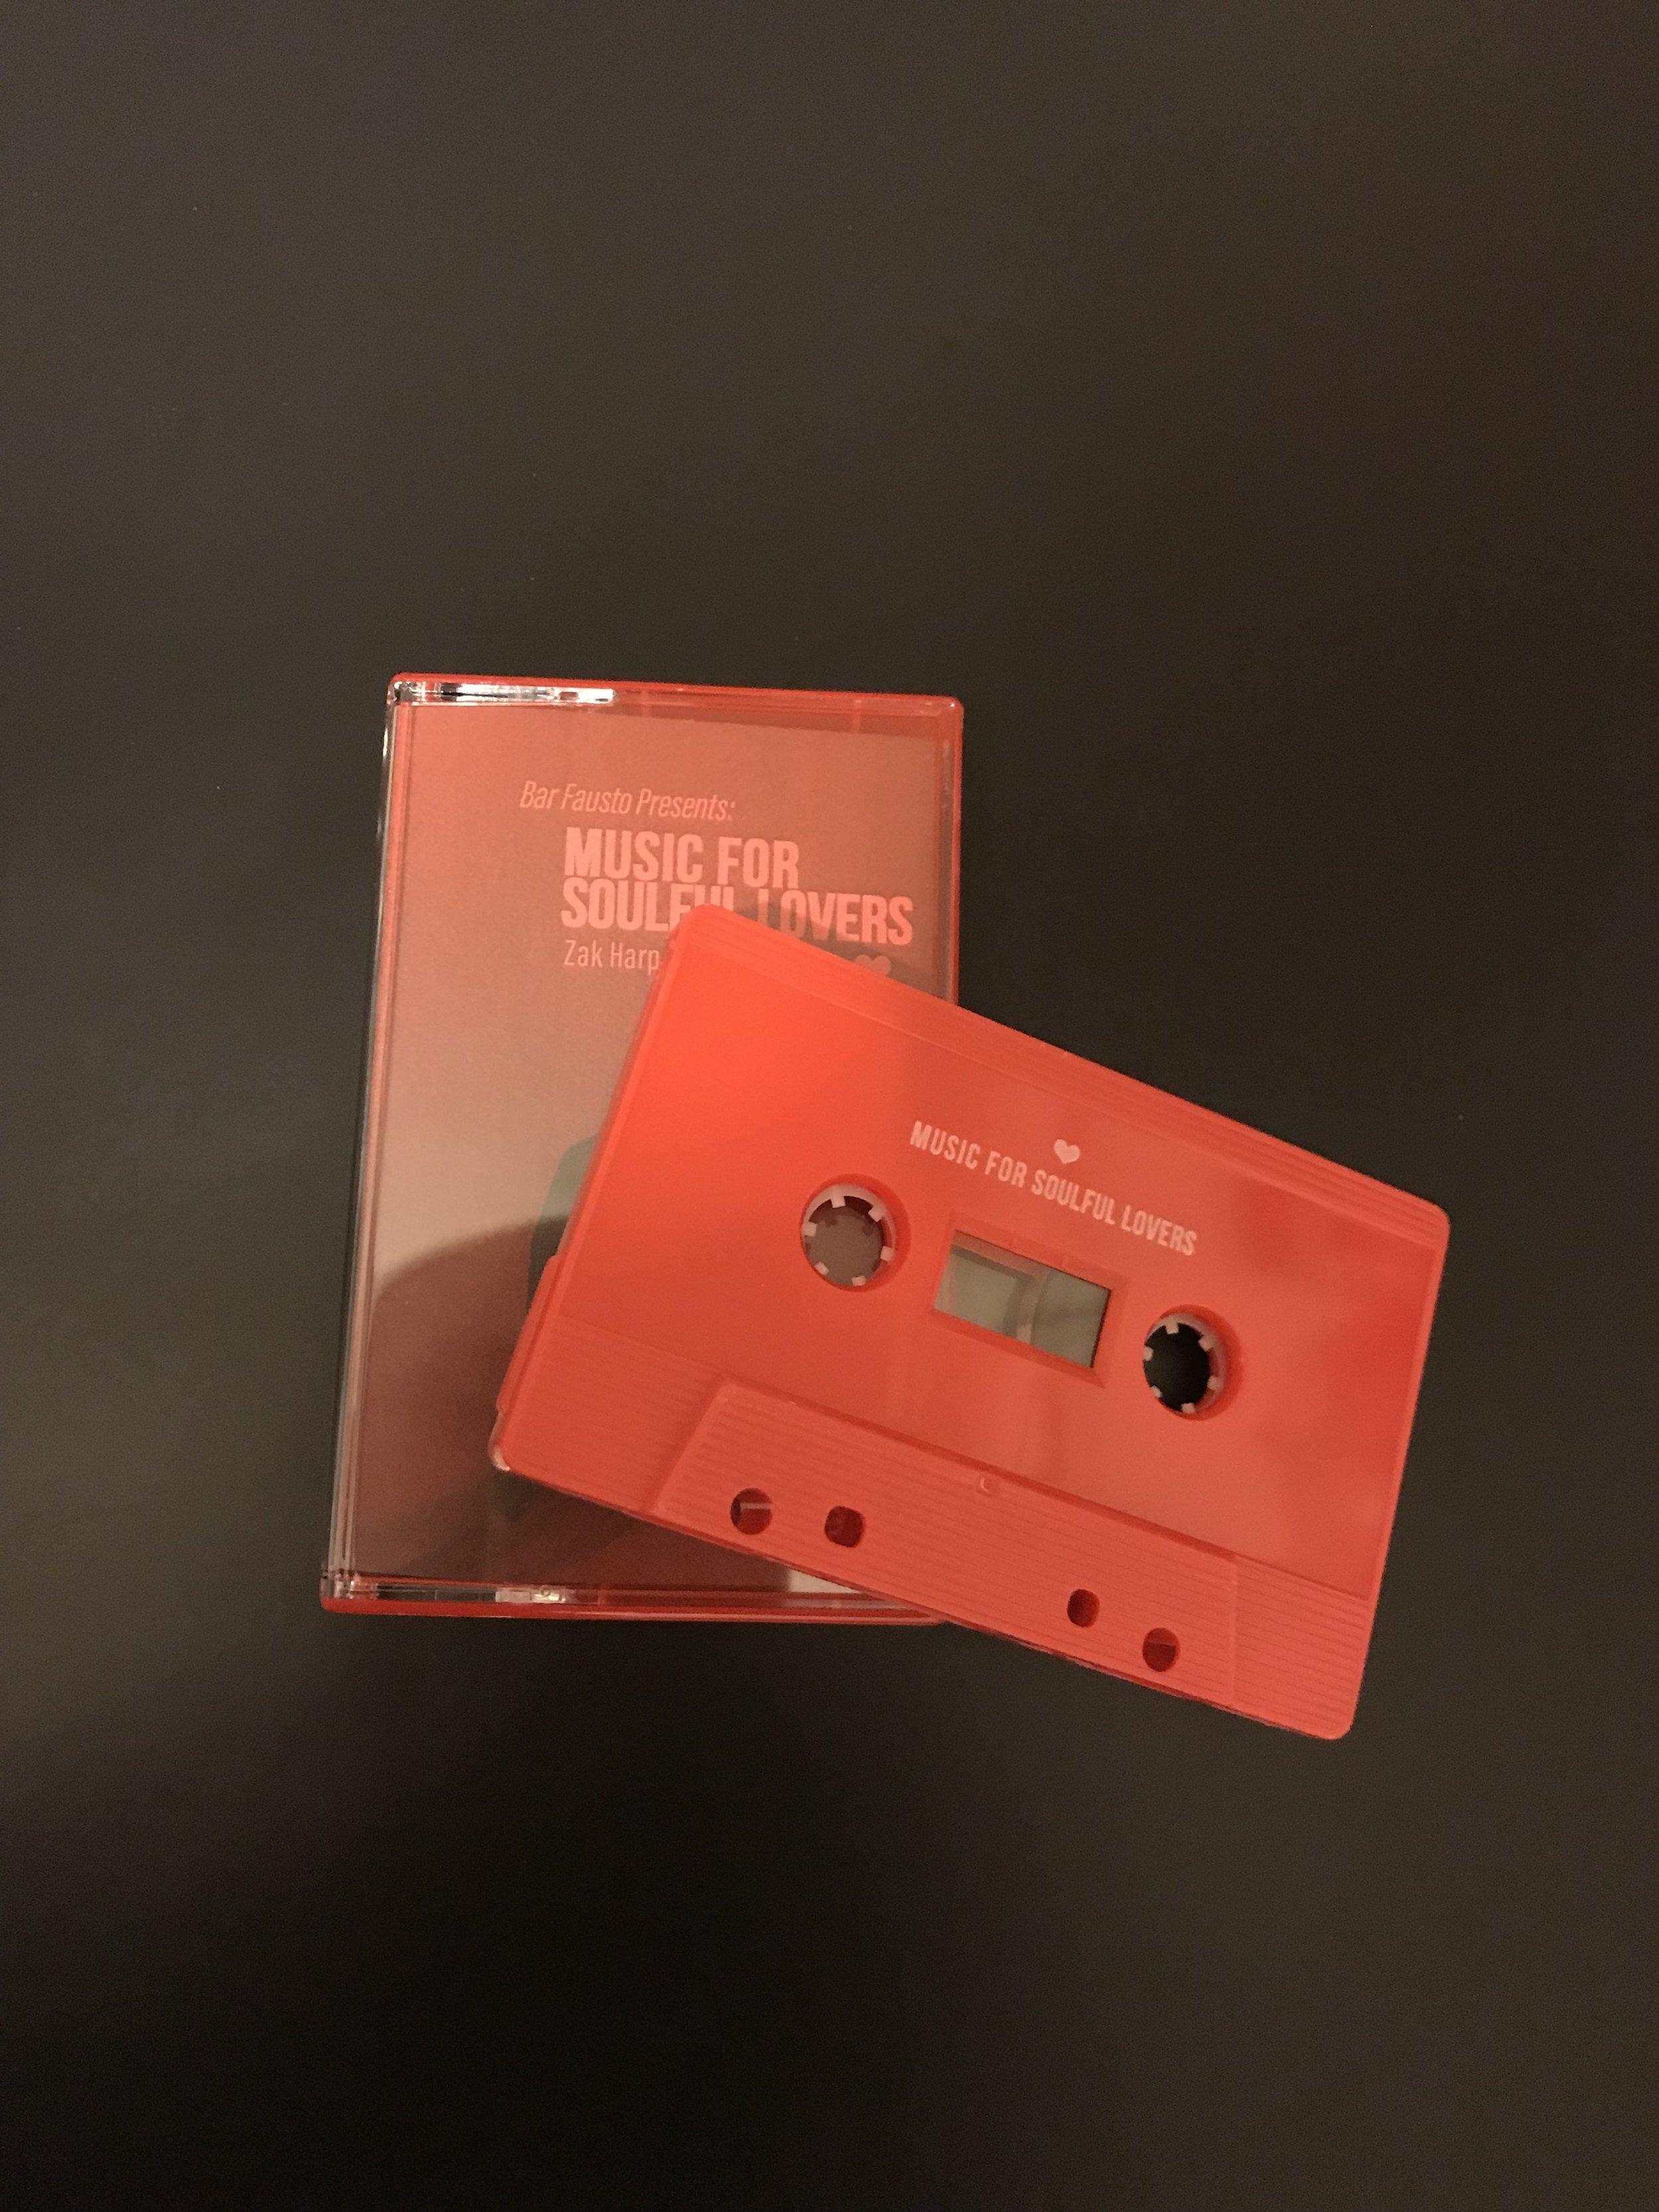 Sneak peak at what the tapes look like.